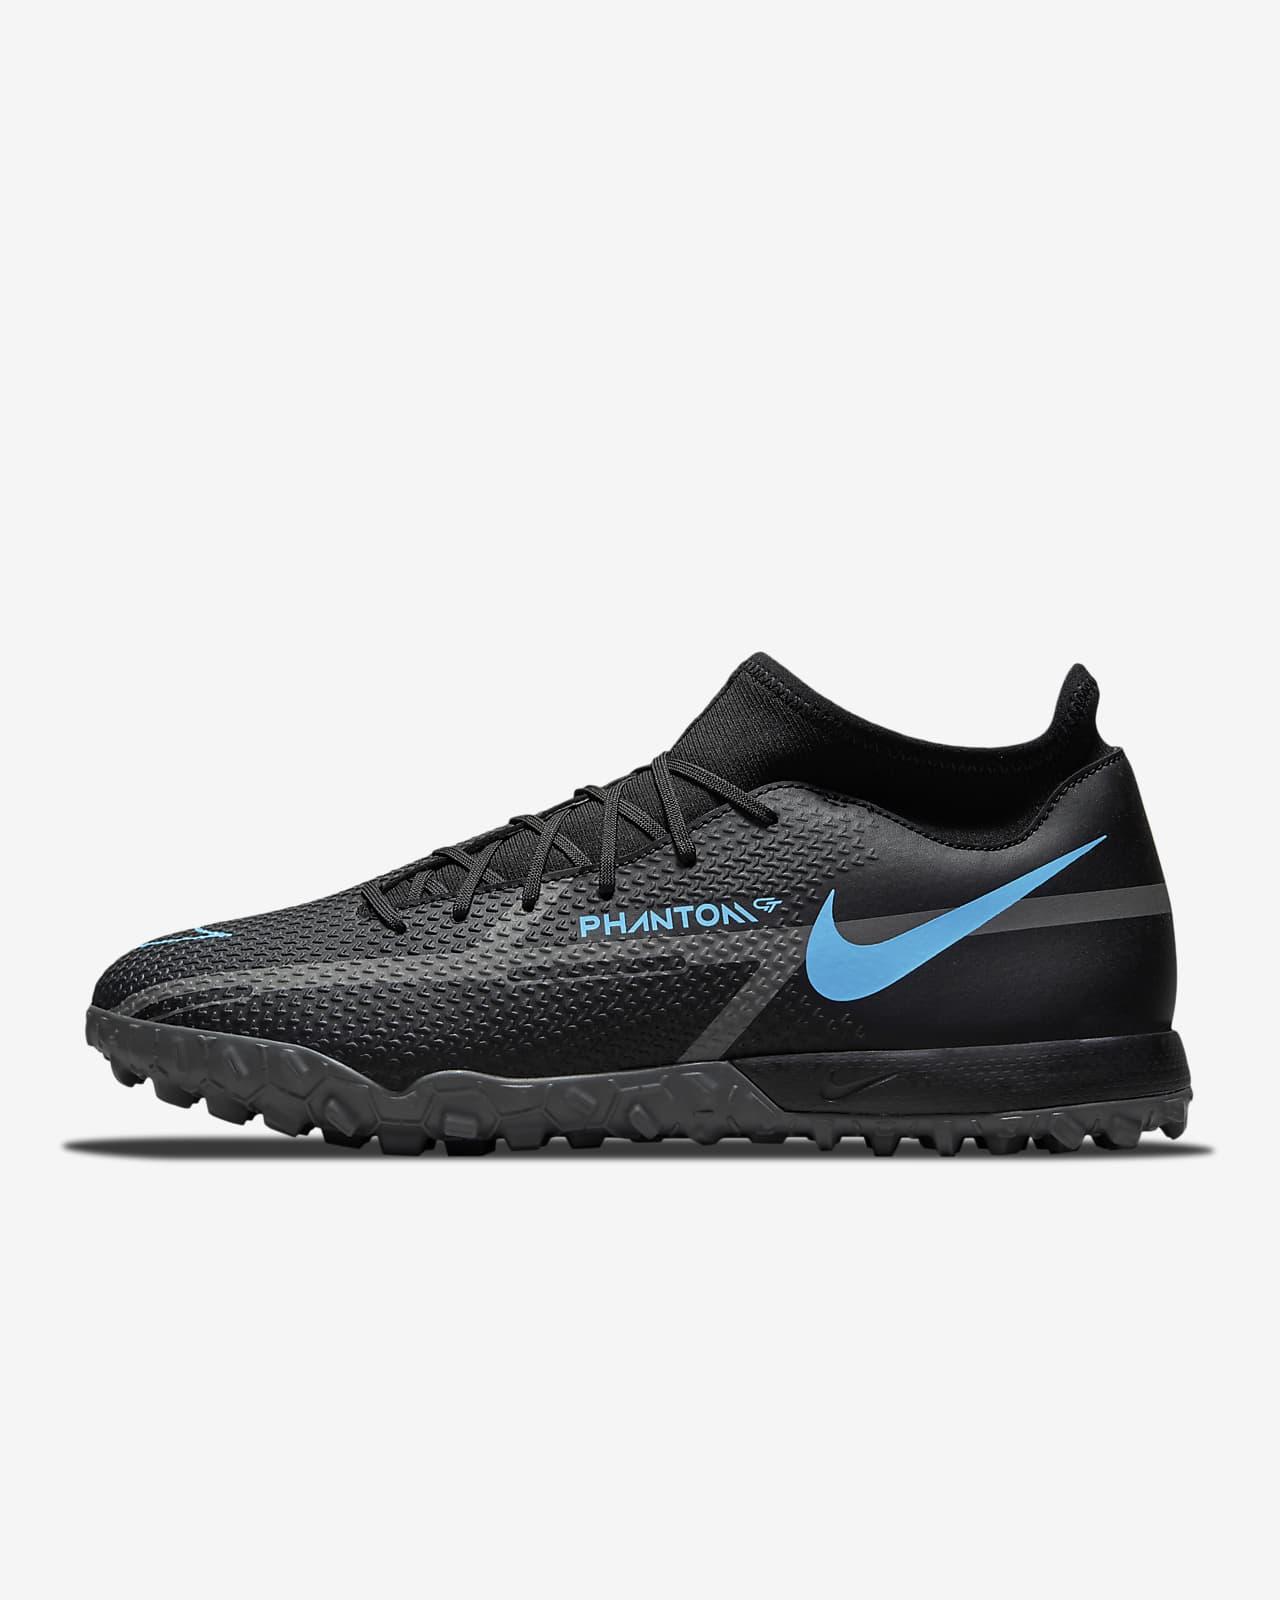 Calzado de fútbol para pasto sintético (turf) Nike Phantom GT2 Academy Dynamic Fit TF